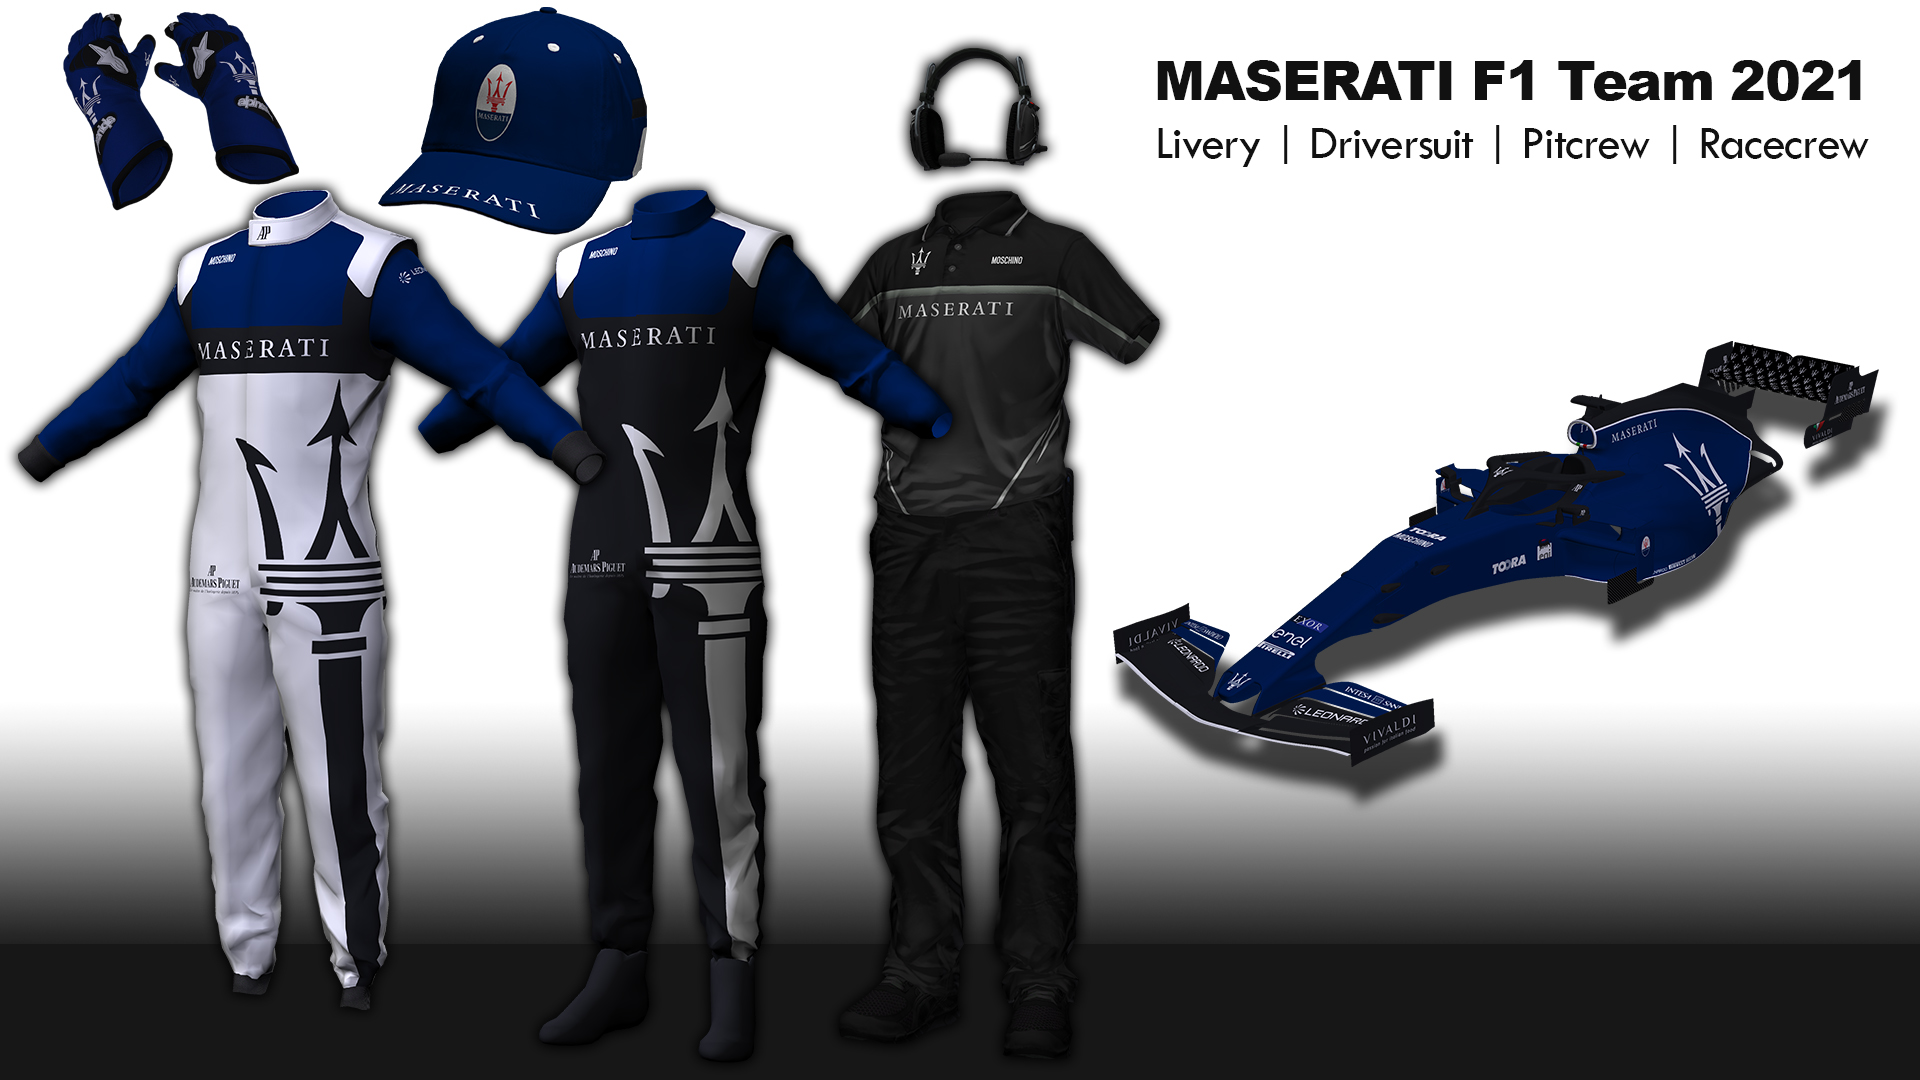 MaseratiTeamGear.jpg